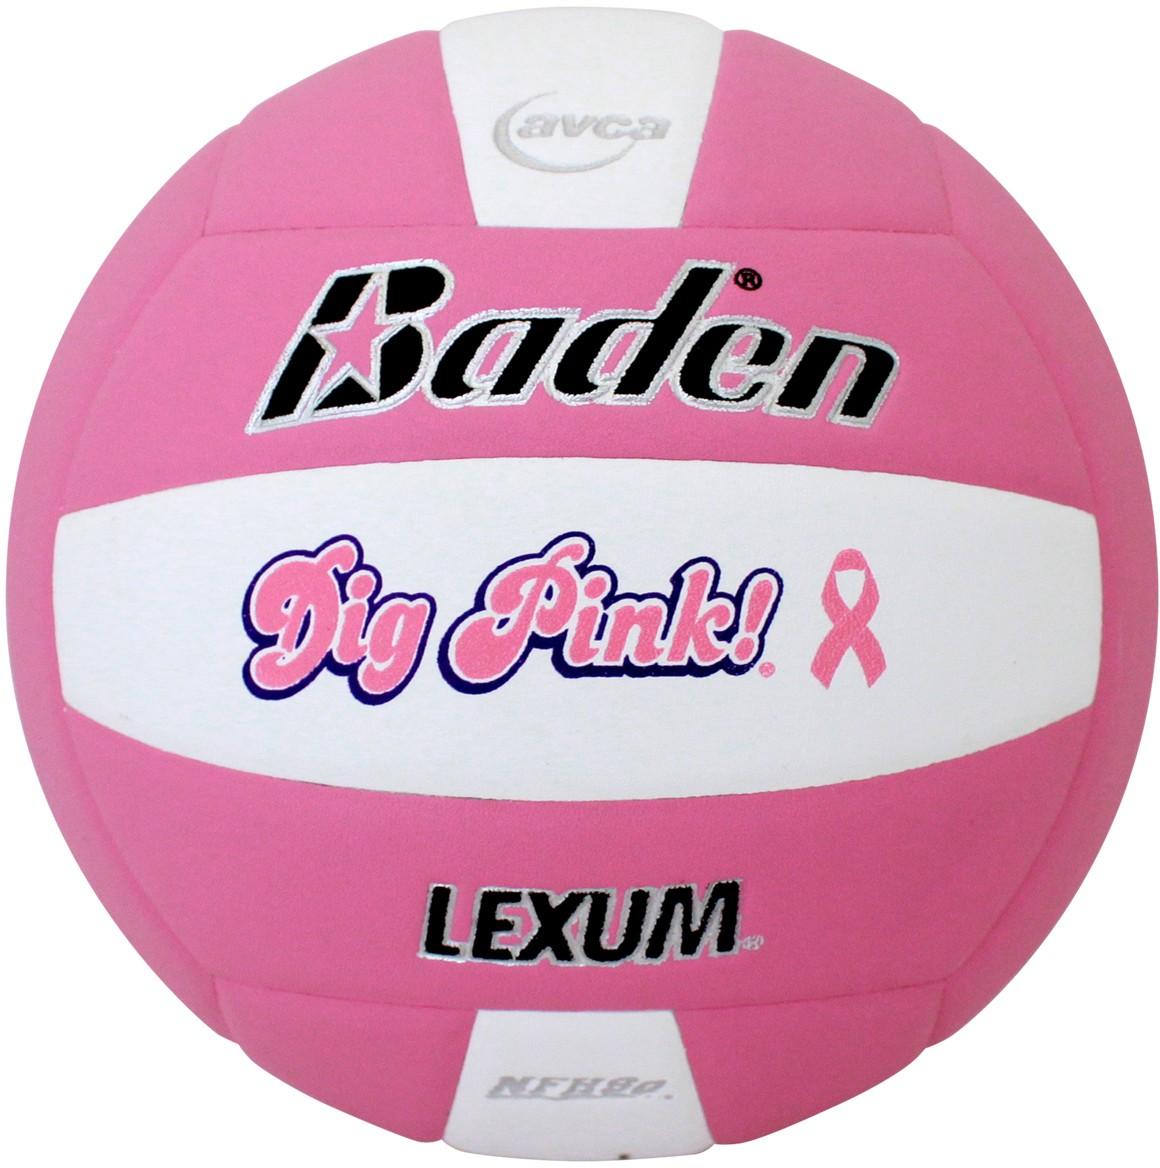 Baden Vx450c Lexum Soft Touch Composite Volleyball Colors